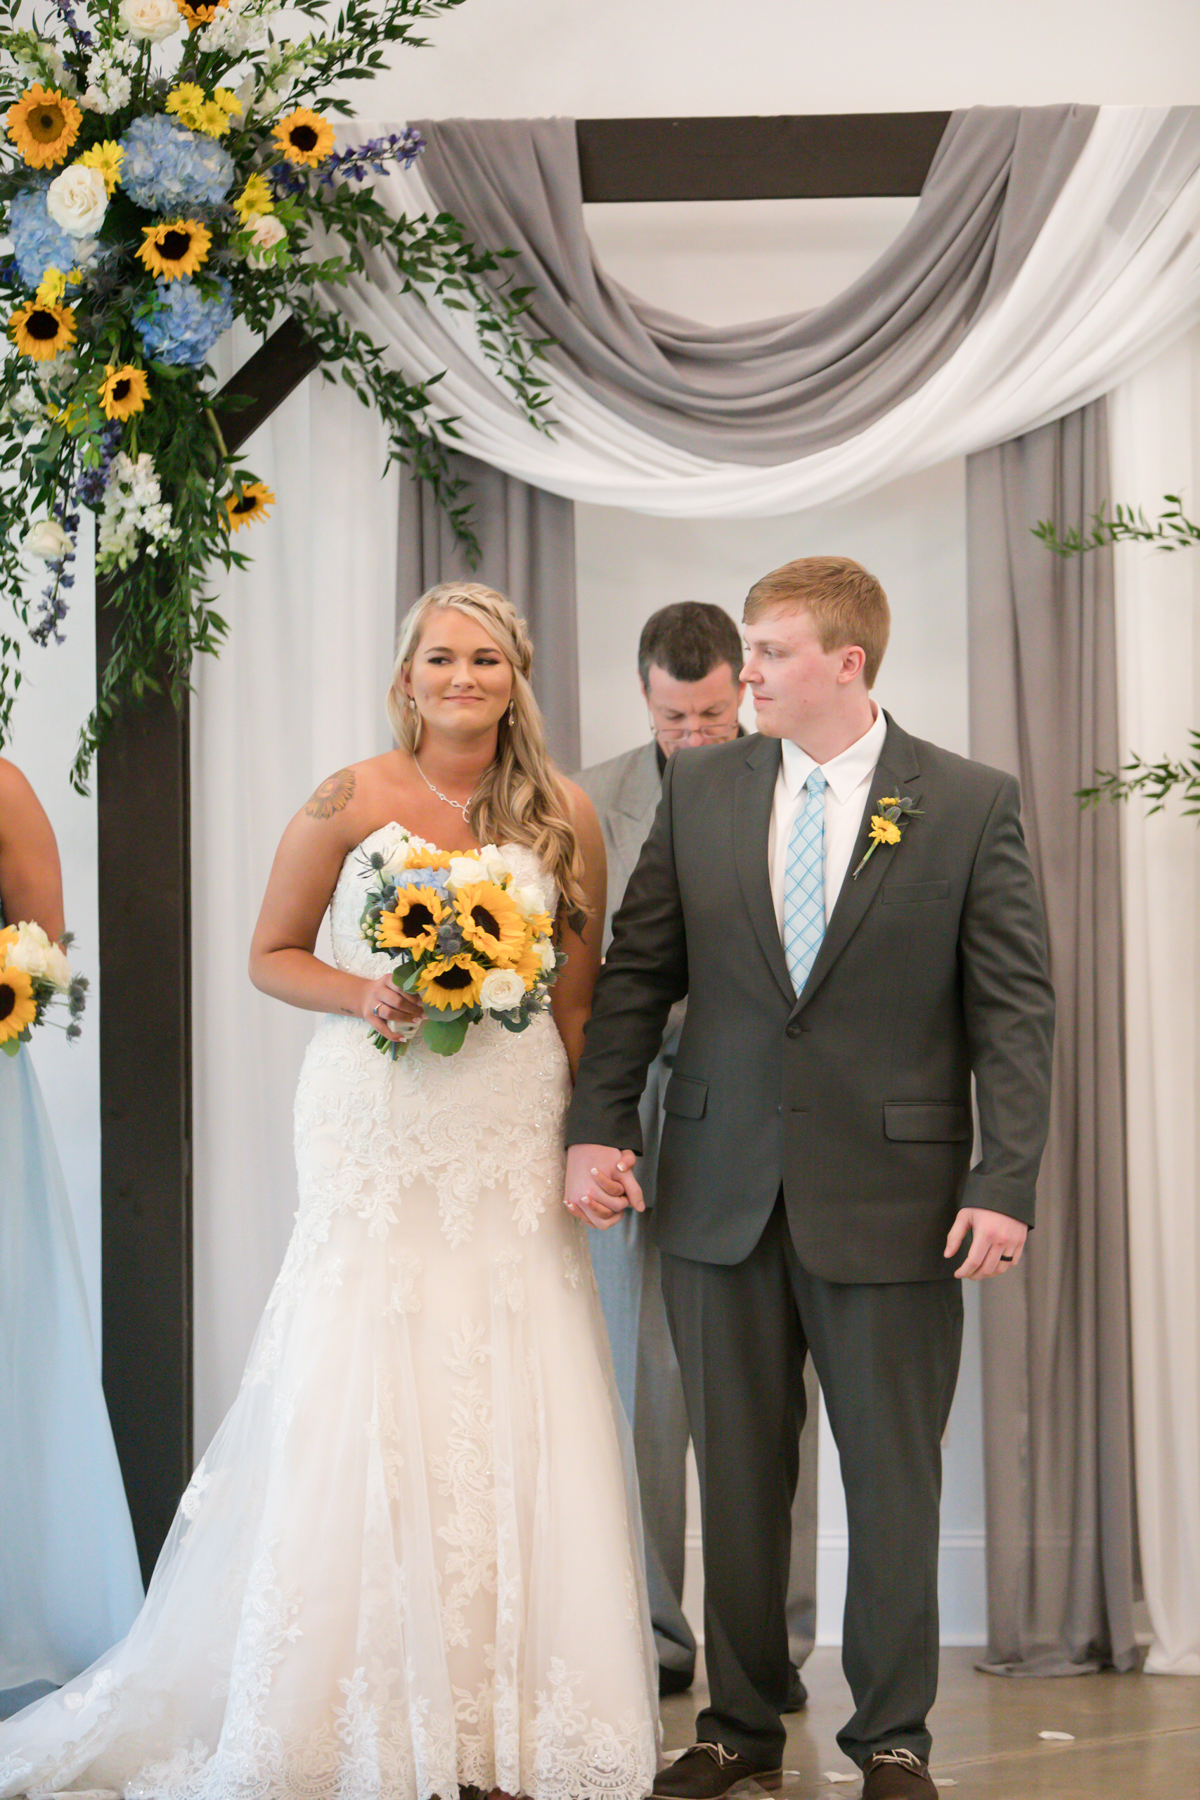 The-venue-at-white-oak-farms-wedding-nashville-wedding-photographers-0168.jpg